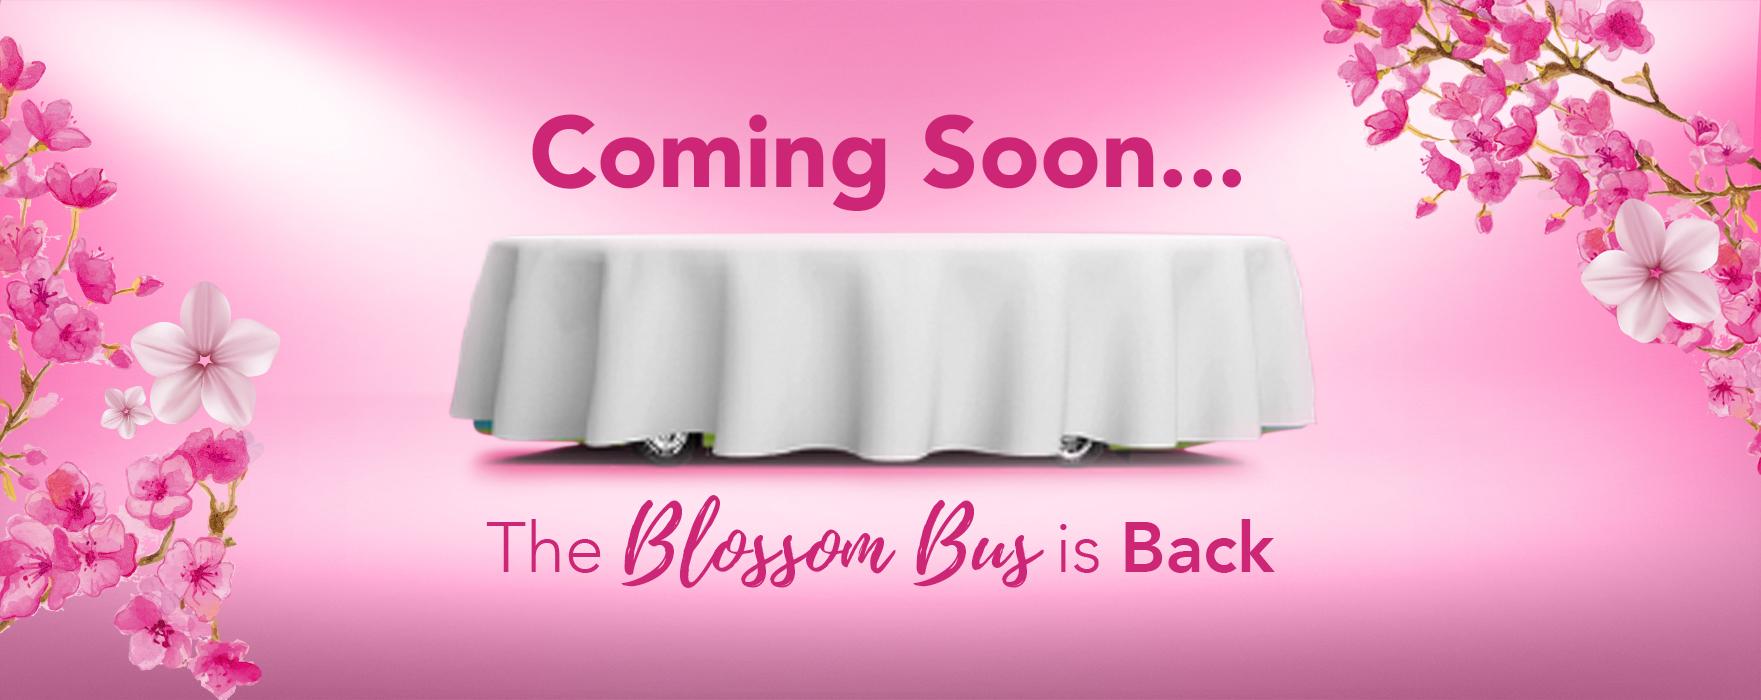 CB_coming soon2